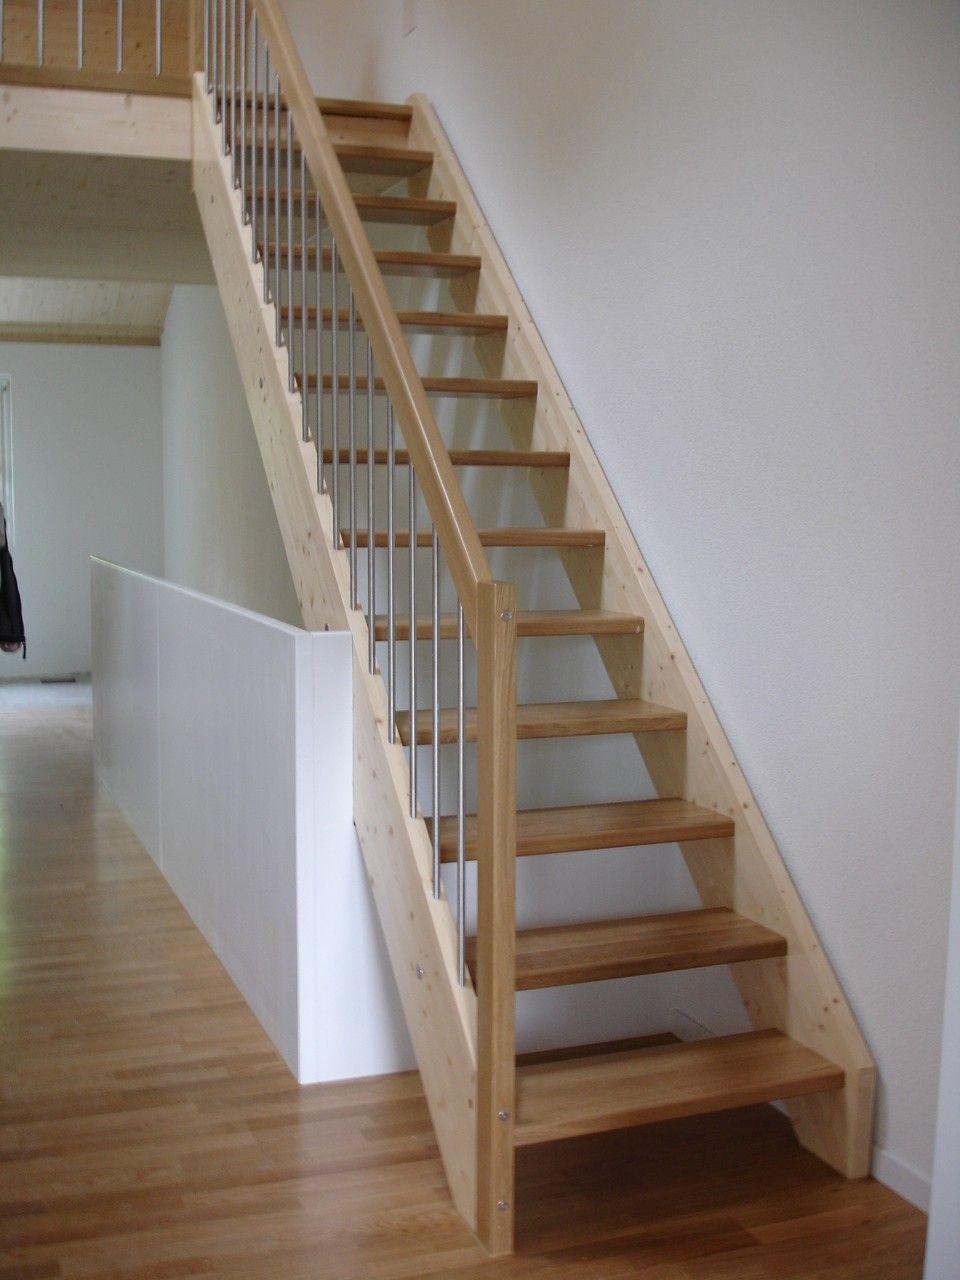 Stair Image 66